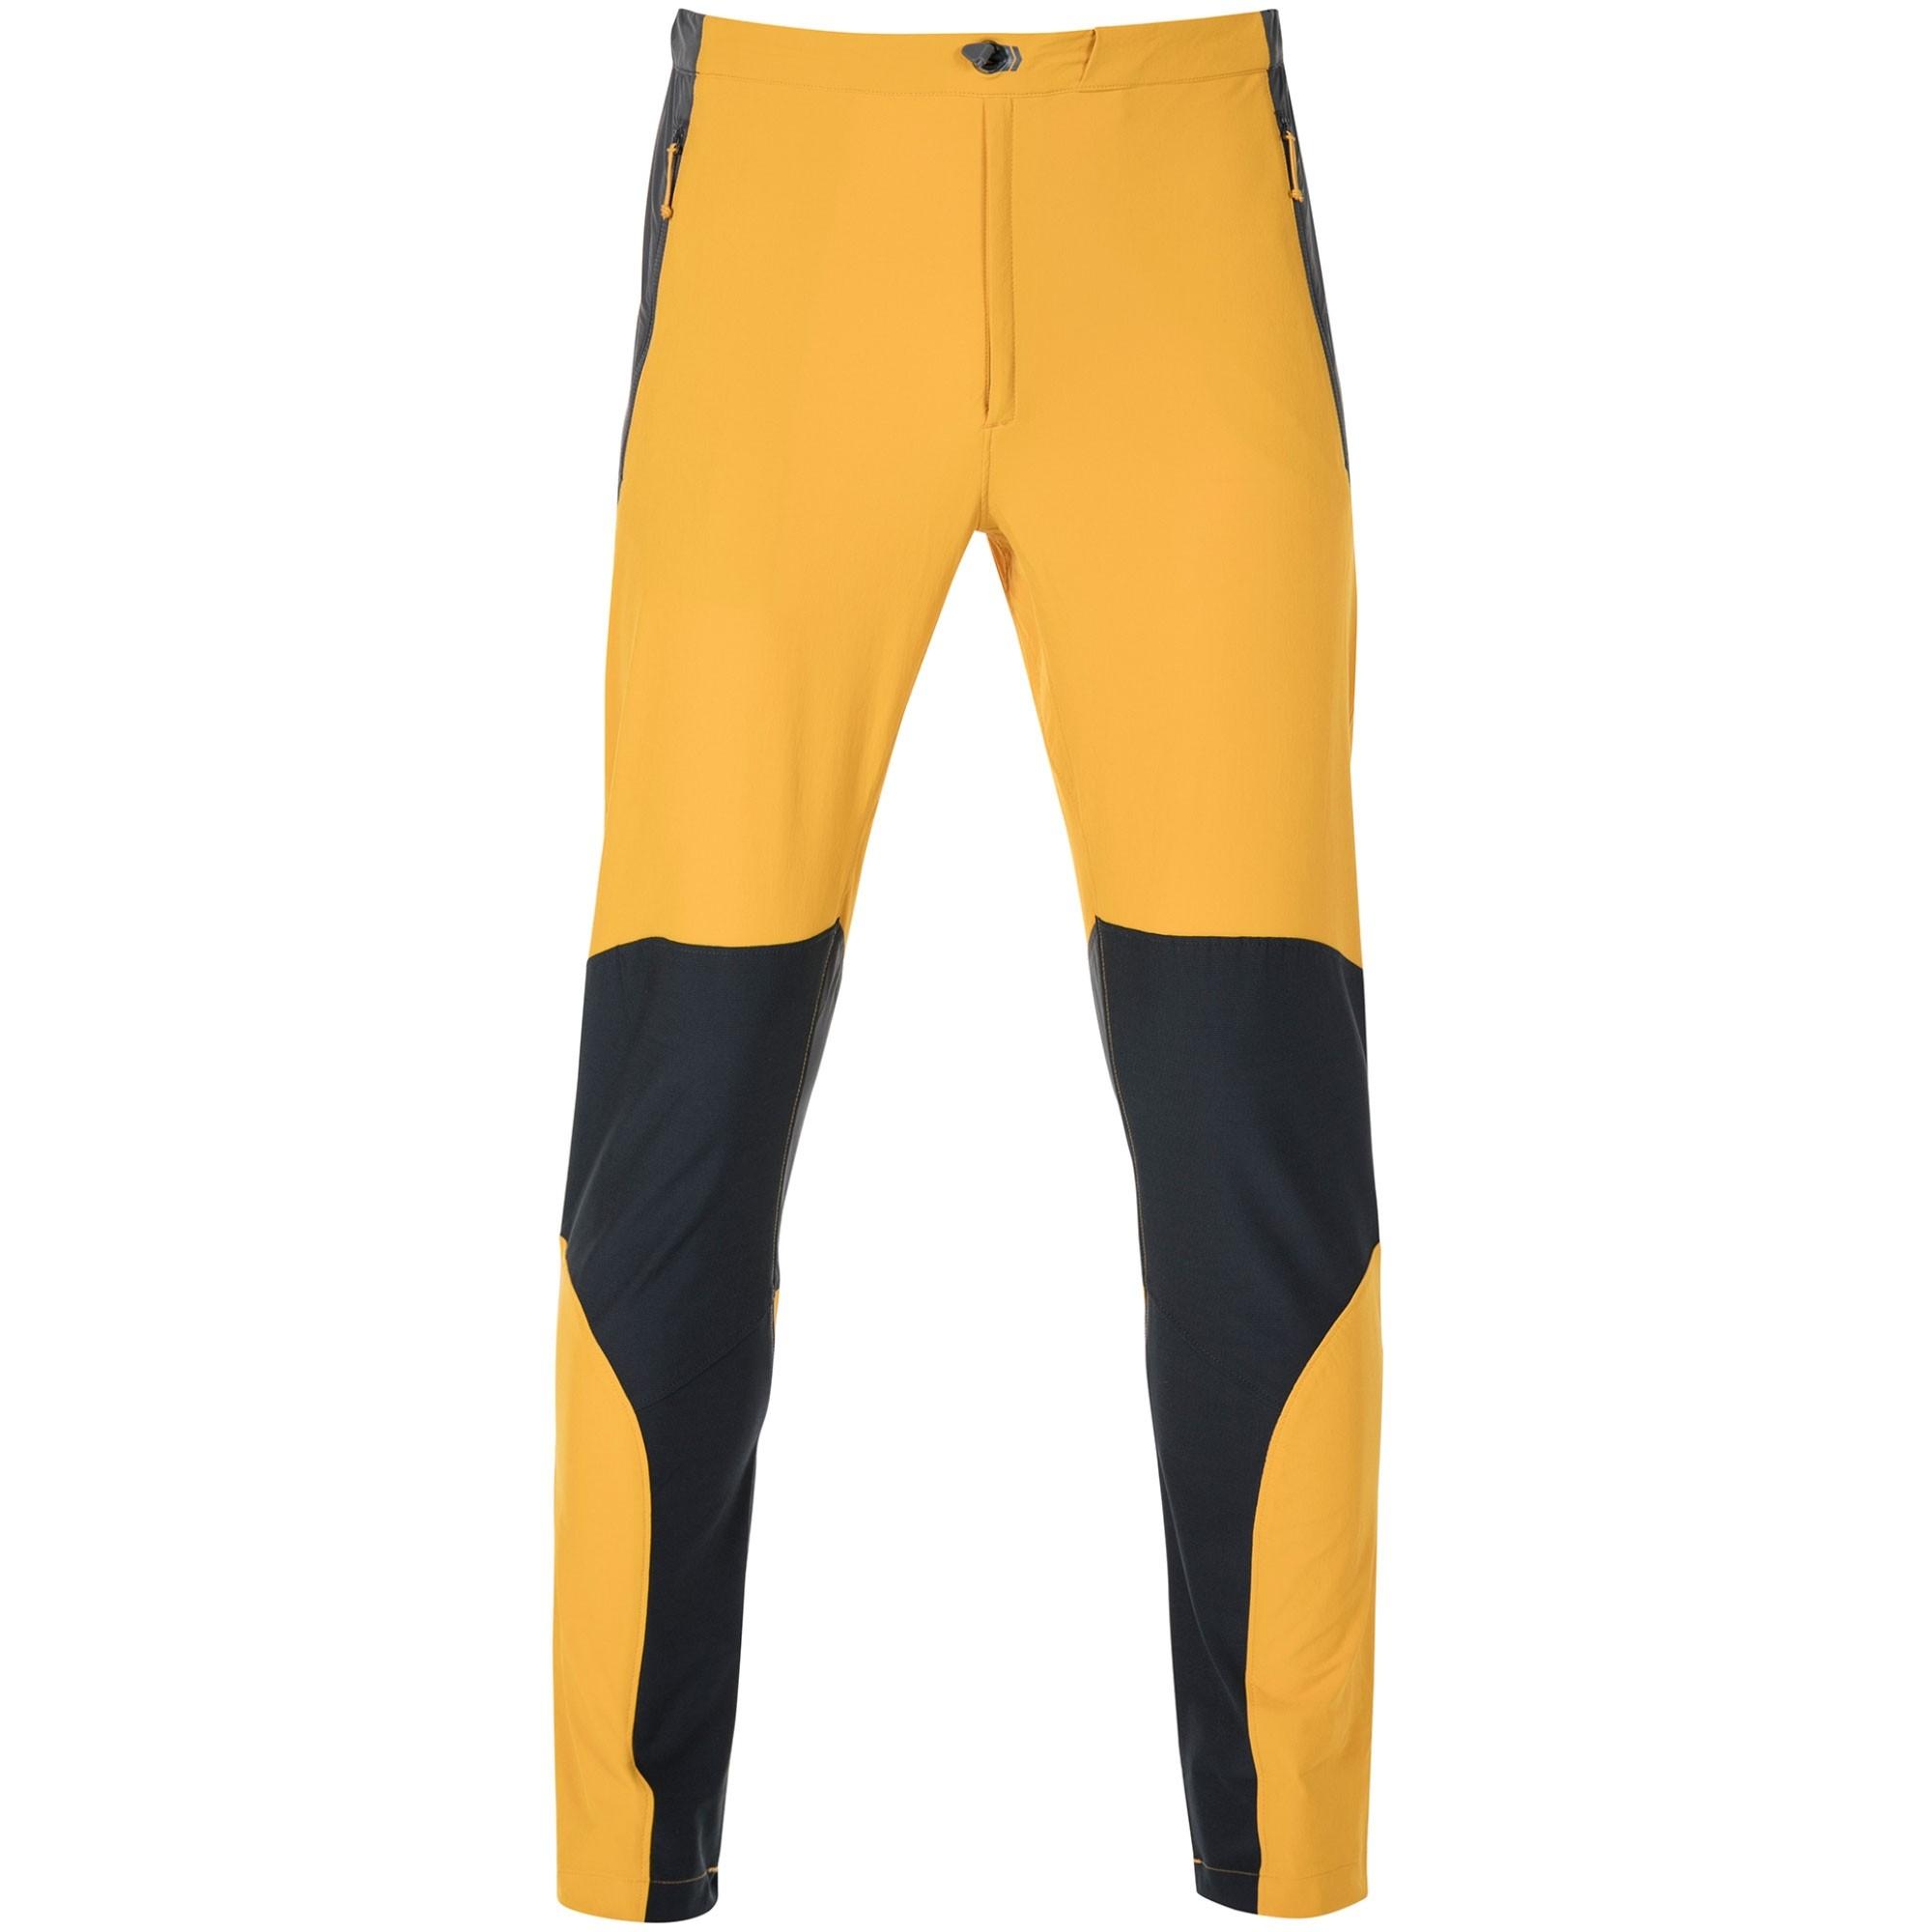 Im Bergsteiger Test: Rab Torque Pants